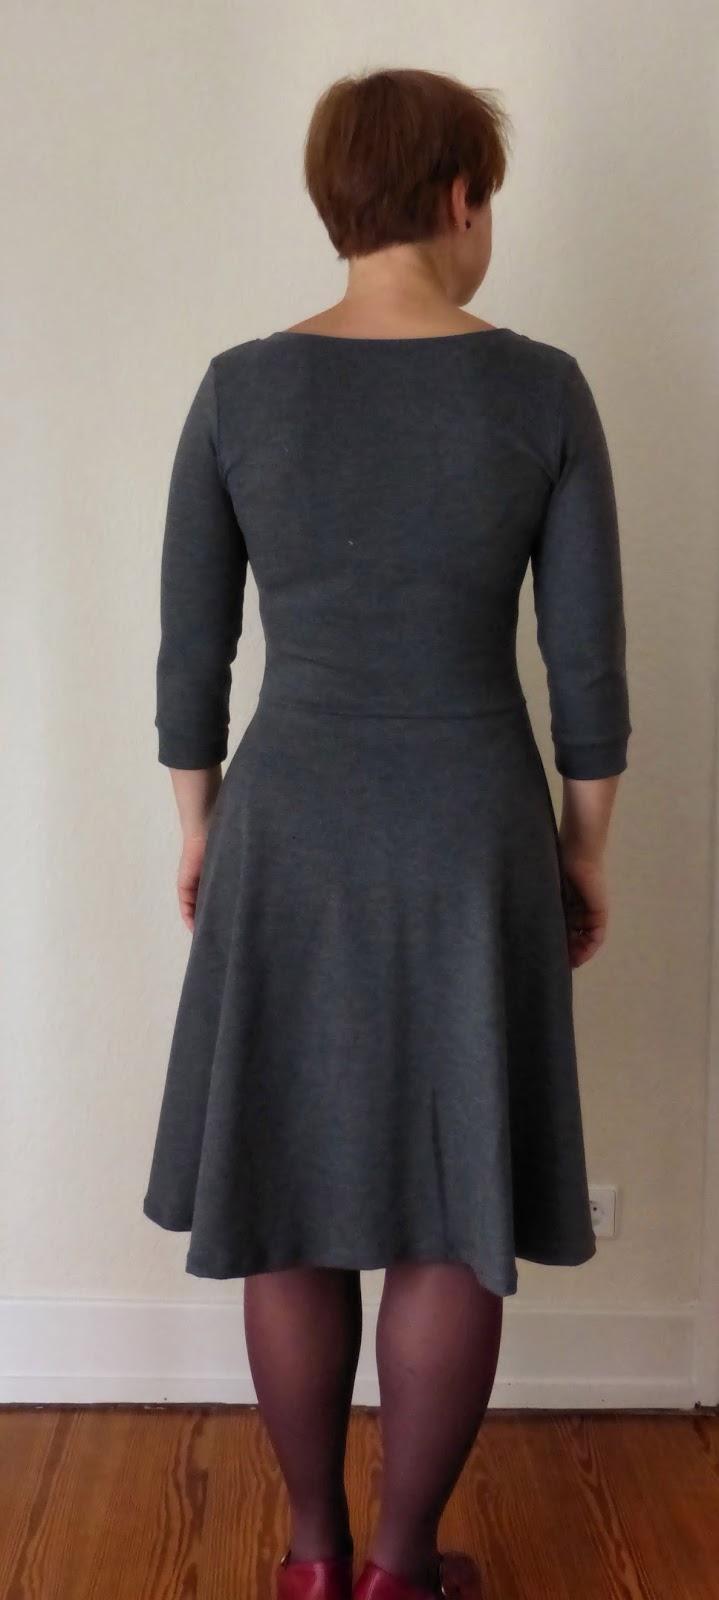 Kleidermanie: Lady Skater